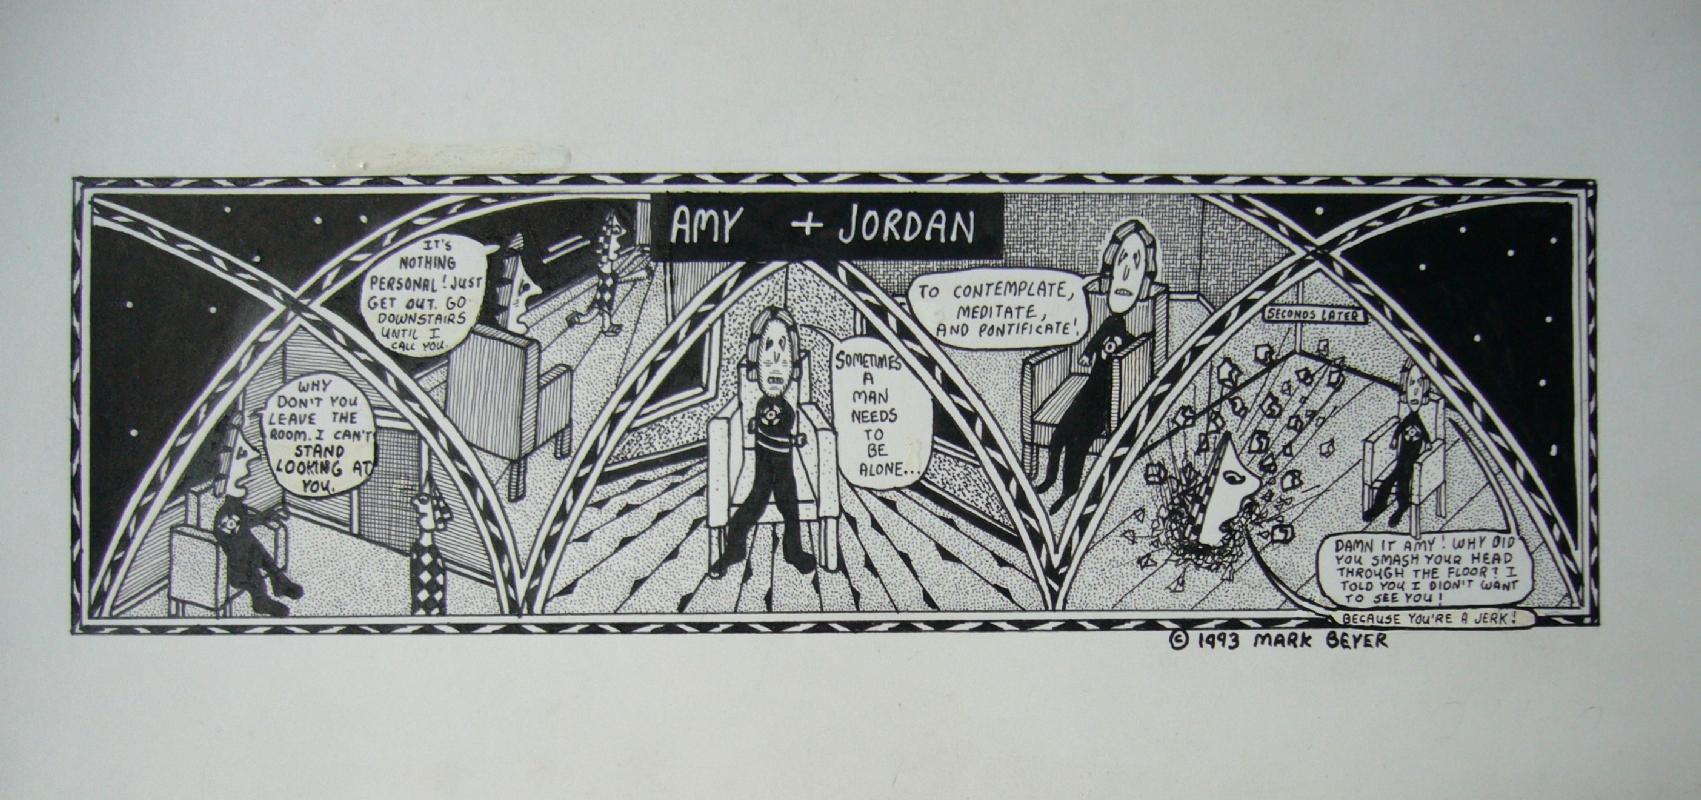 Beyer - Amy & Jordan Comic Art